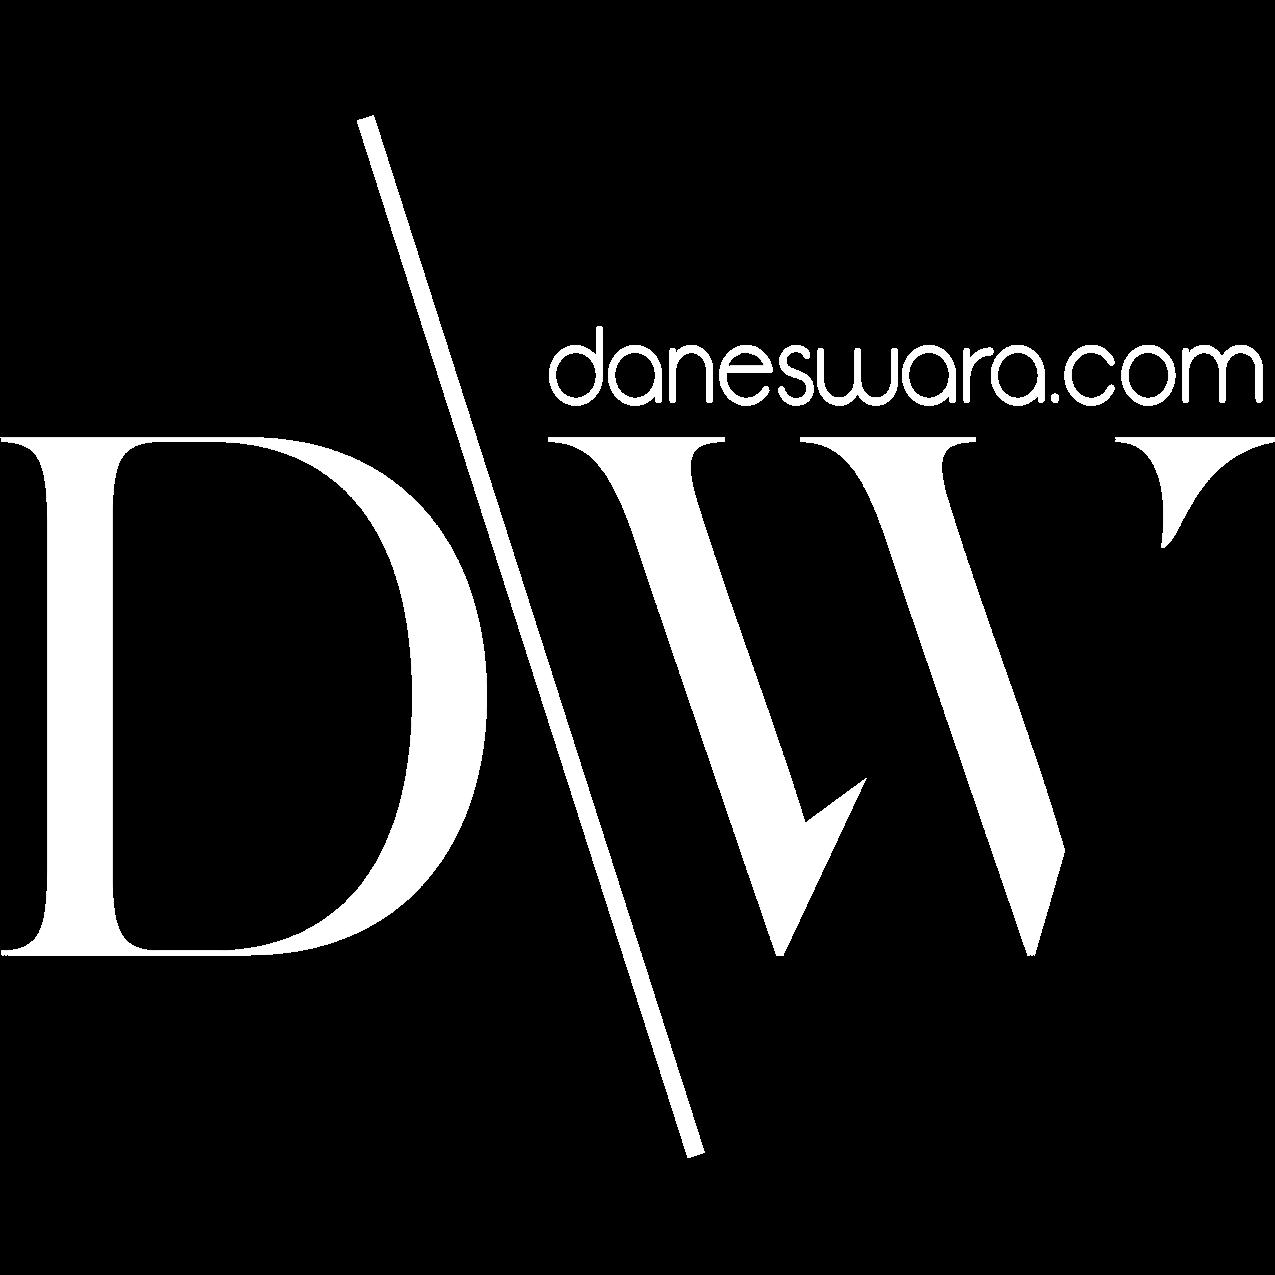 Daneswara Cloting